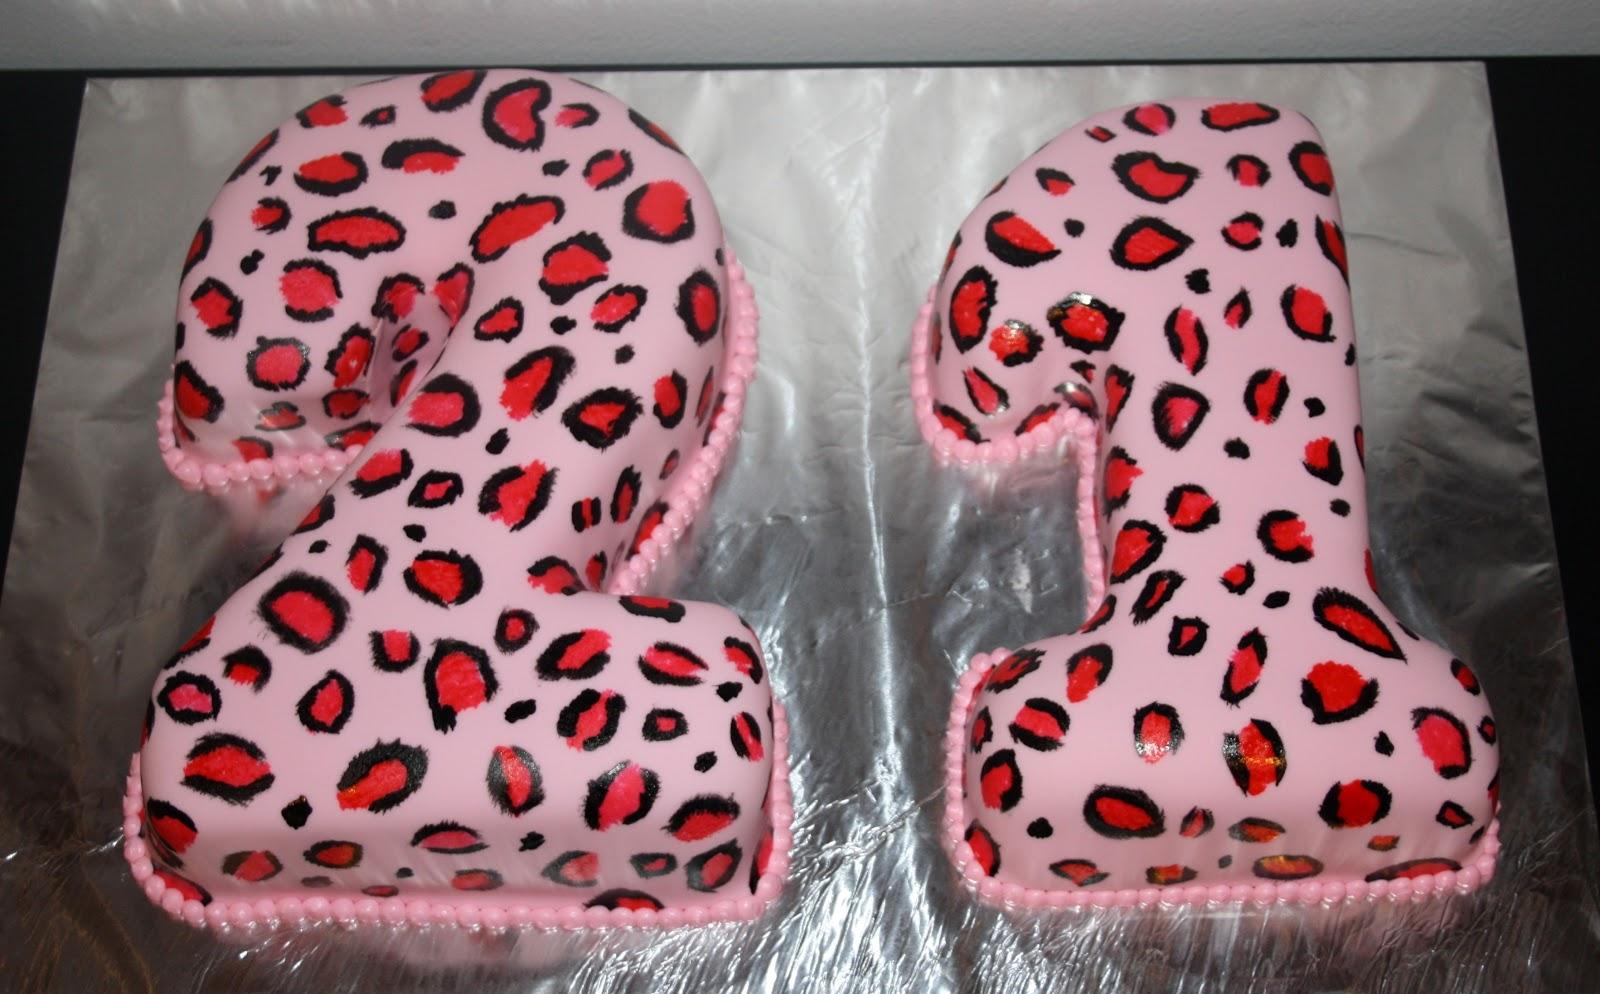 Jacquelines Sweet Shop Pink Cheetah Print 21st Birthday Cake